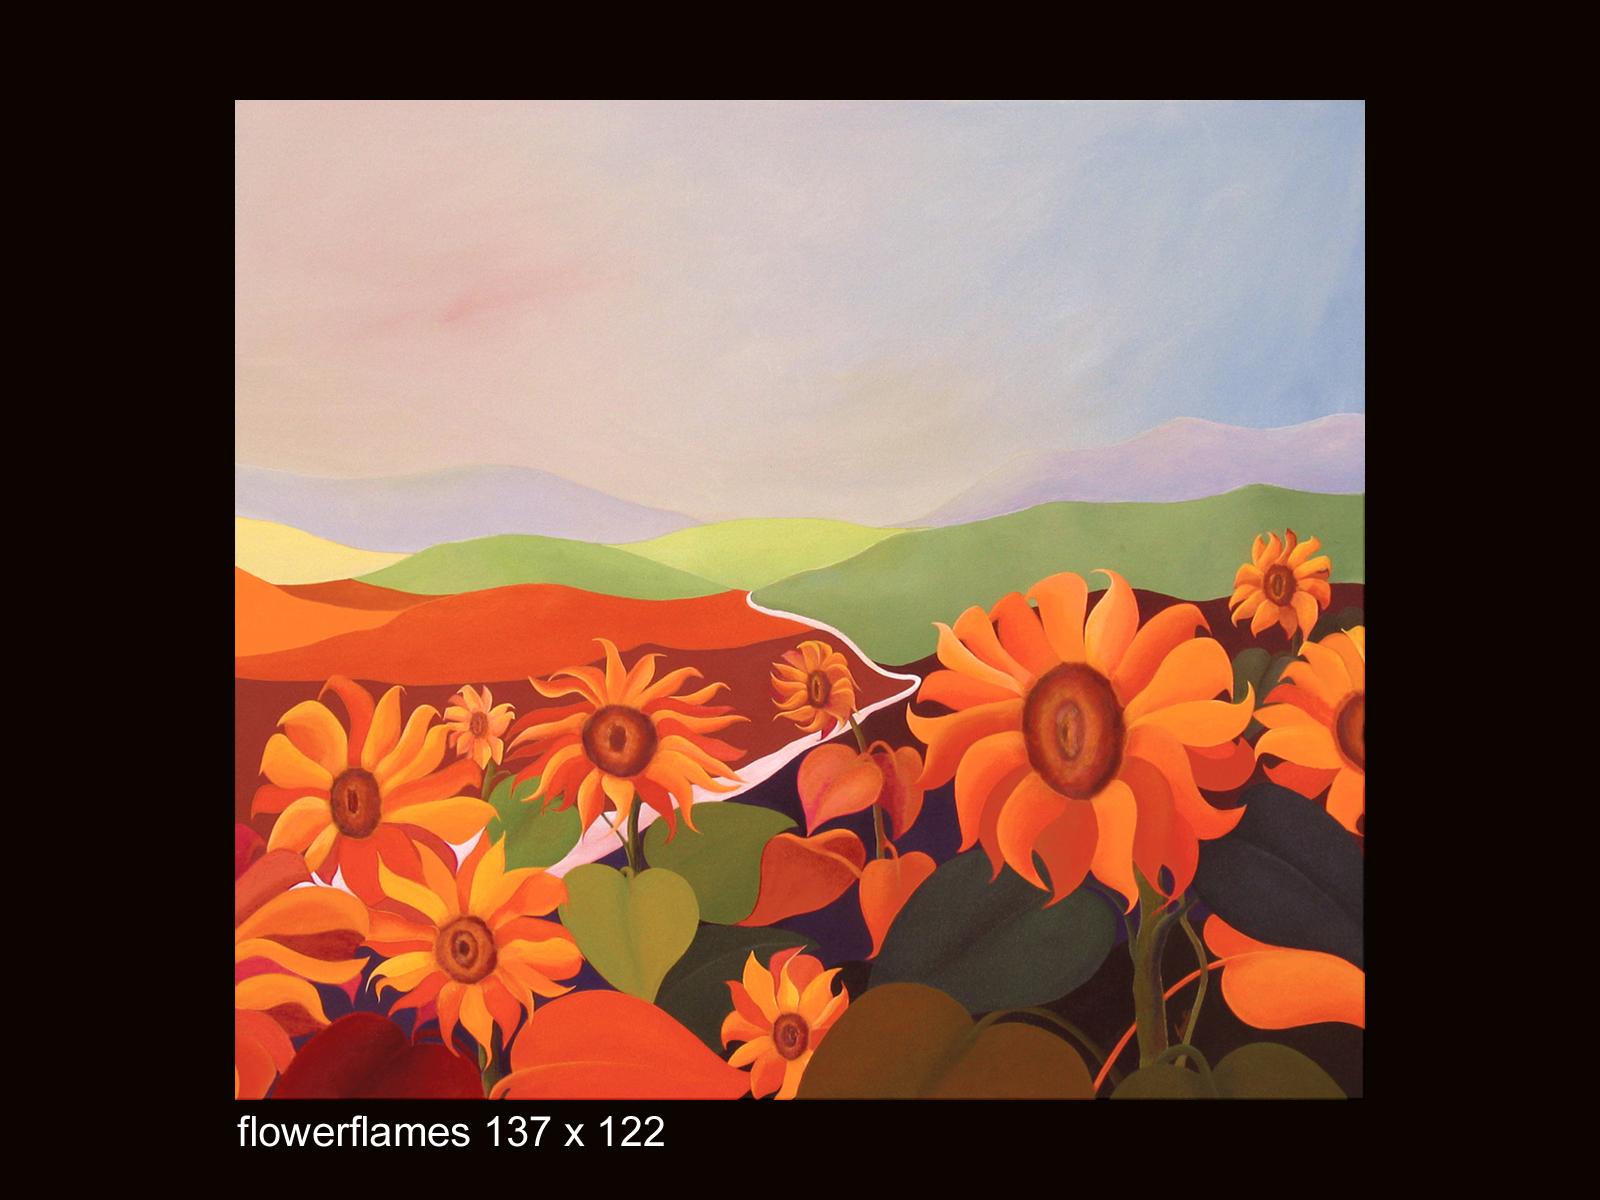 acrylic_flowerflames_137x122a